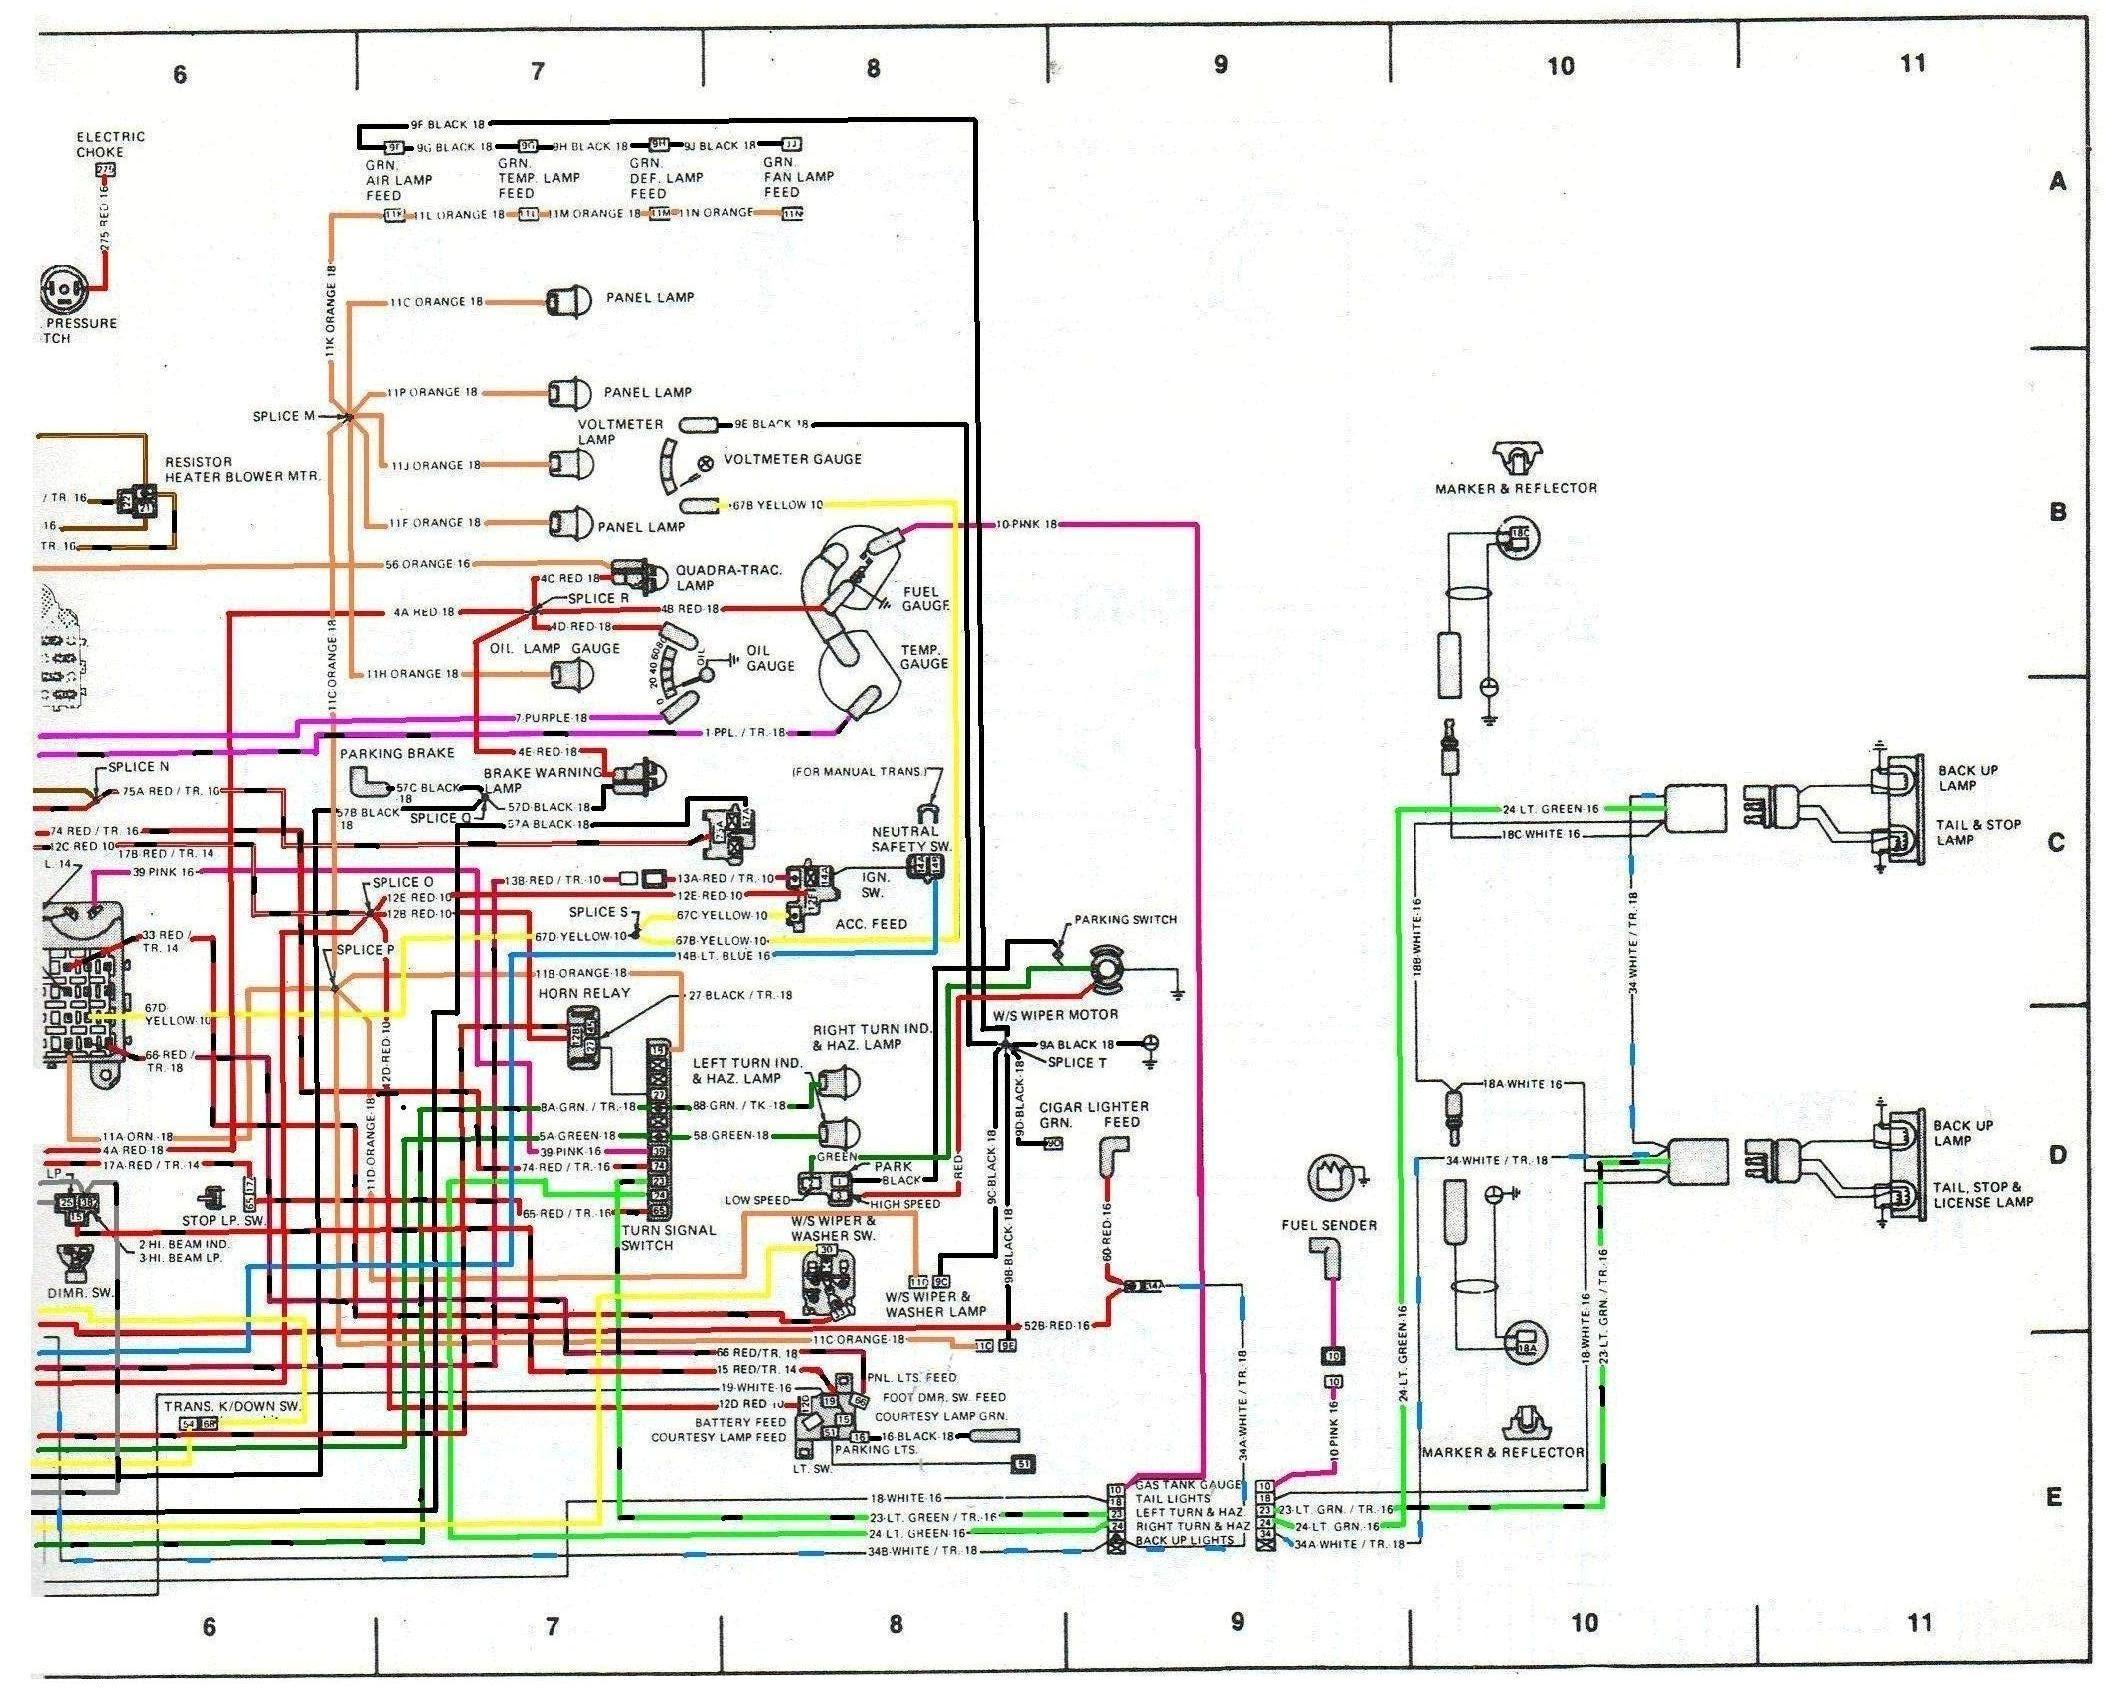 Printable Cj5 Wiring Diagram